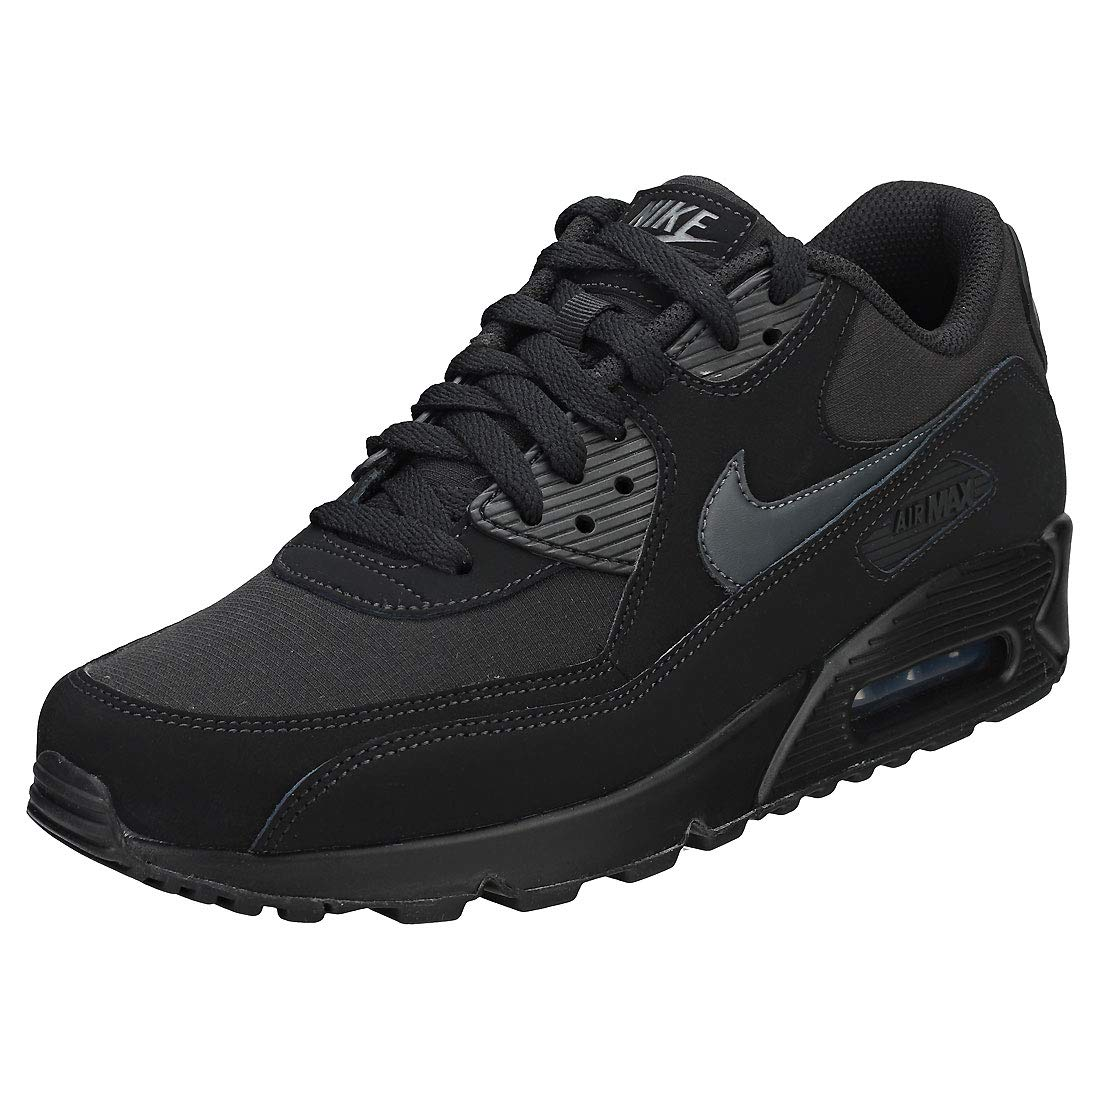 Nike Air Max 90 Essential, Scarpe da Ginnastica Uomo | Negozio  | Gentiluomo/Signora Scarpa